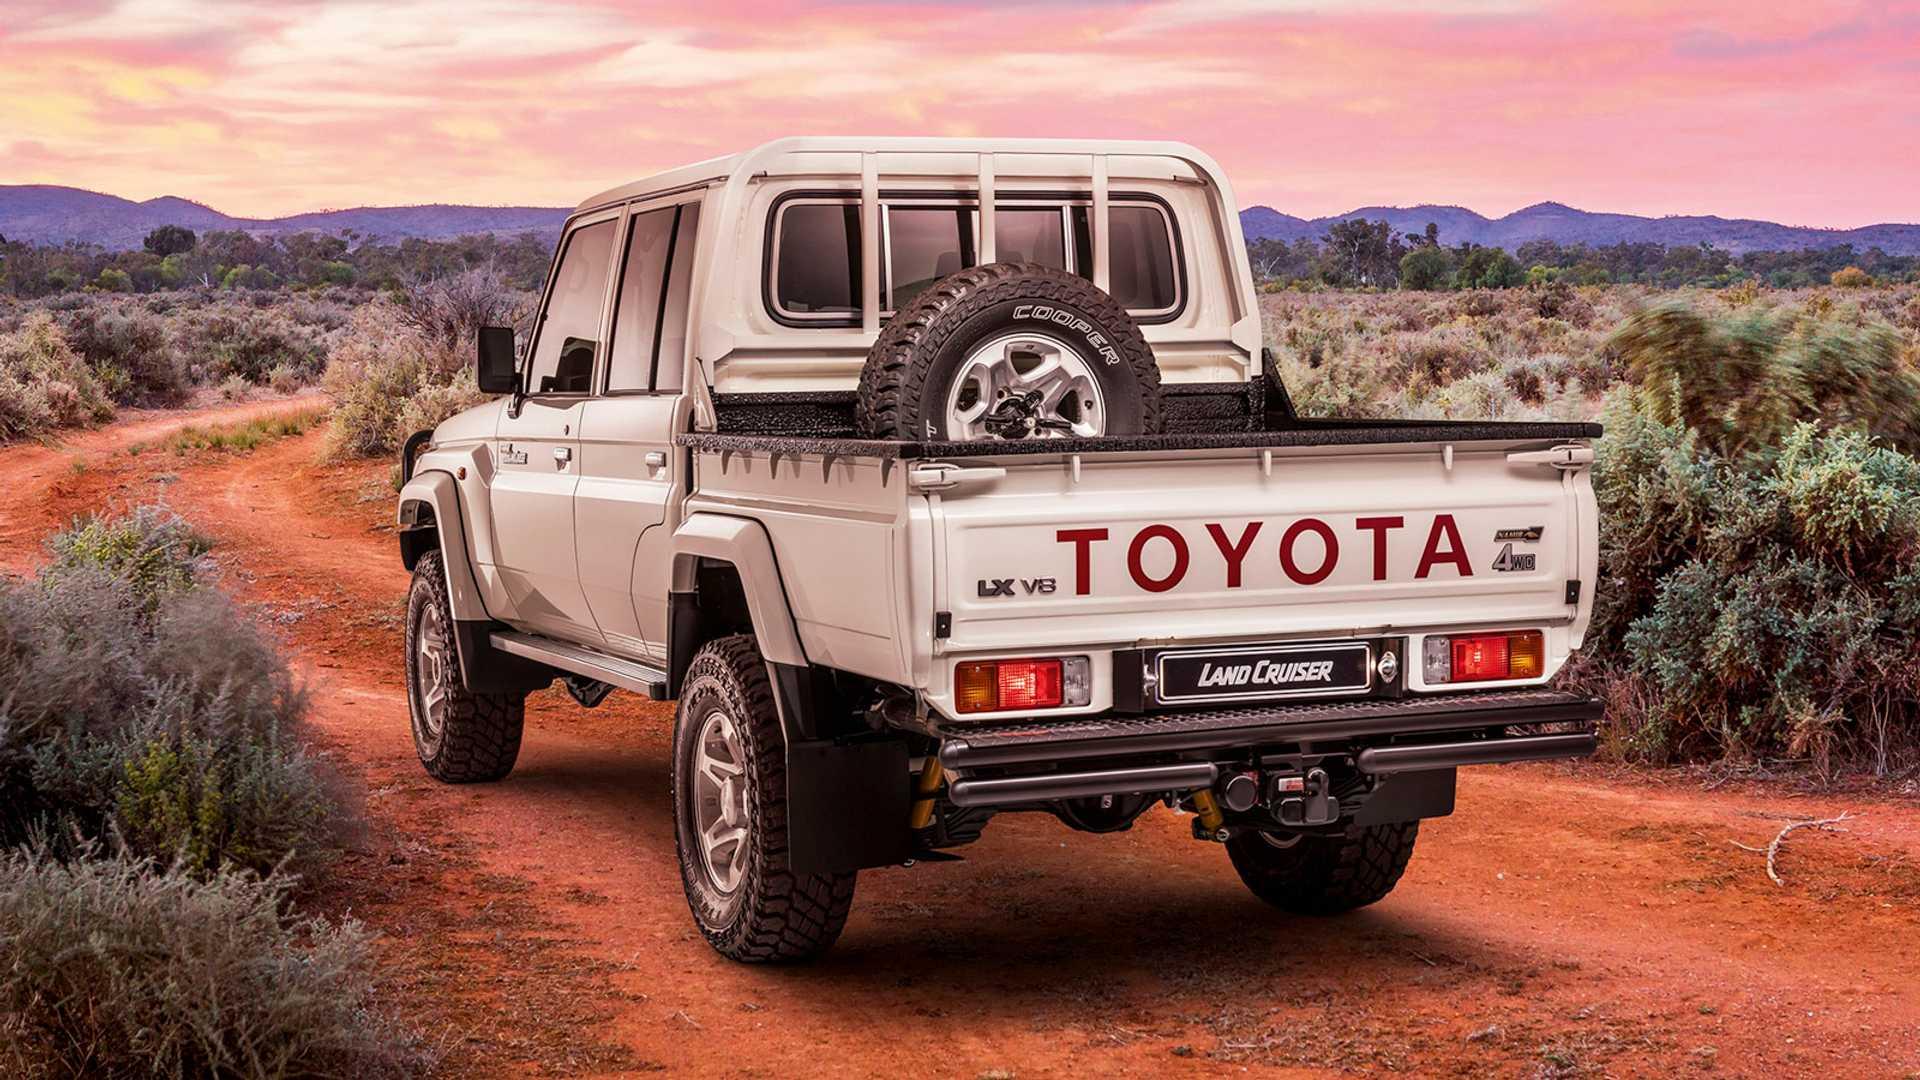 2020 Toyota Land Cruiser Diesel History